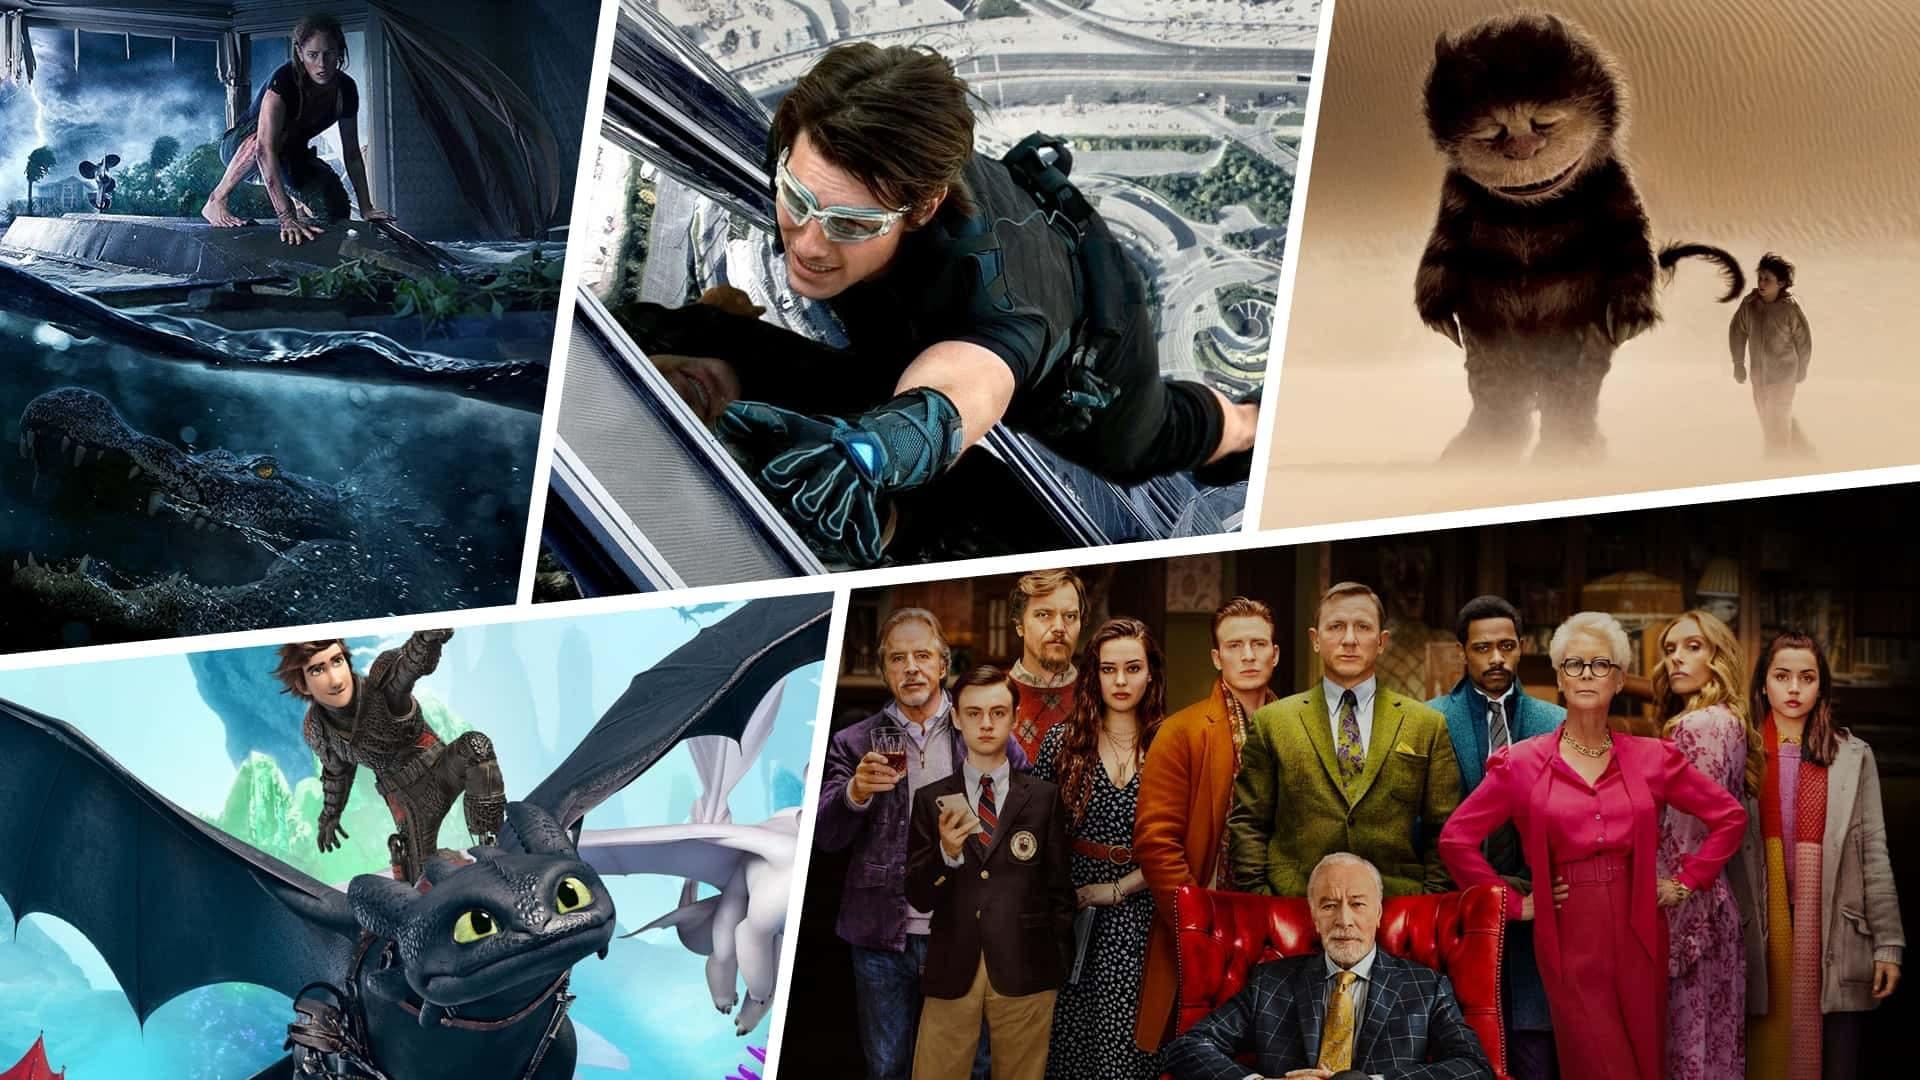 Best New Movies on Amazon Prime (June 2020) - StudioBinder